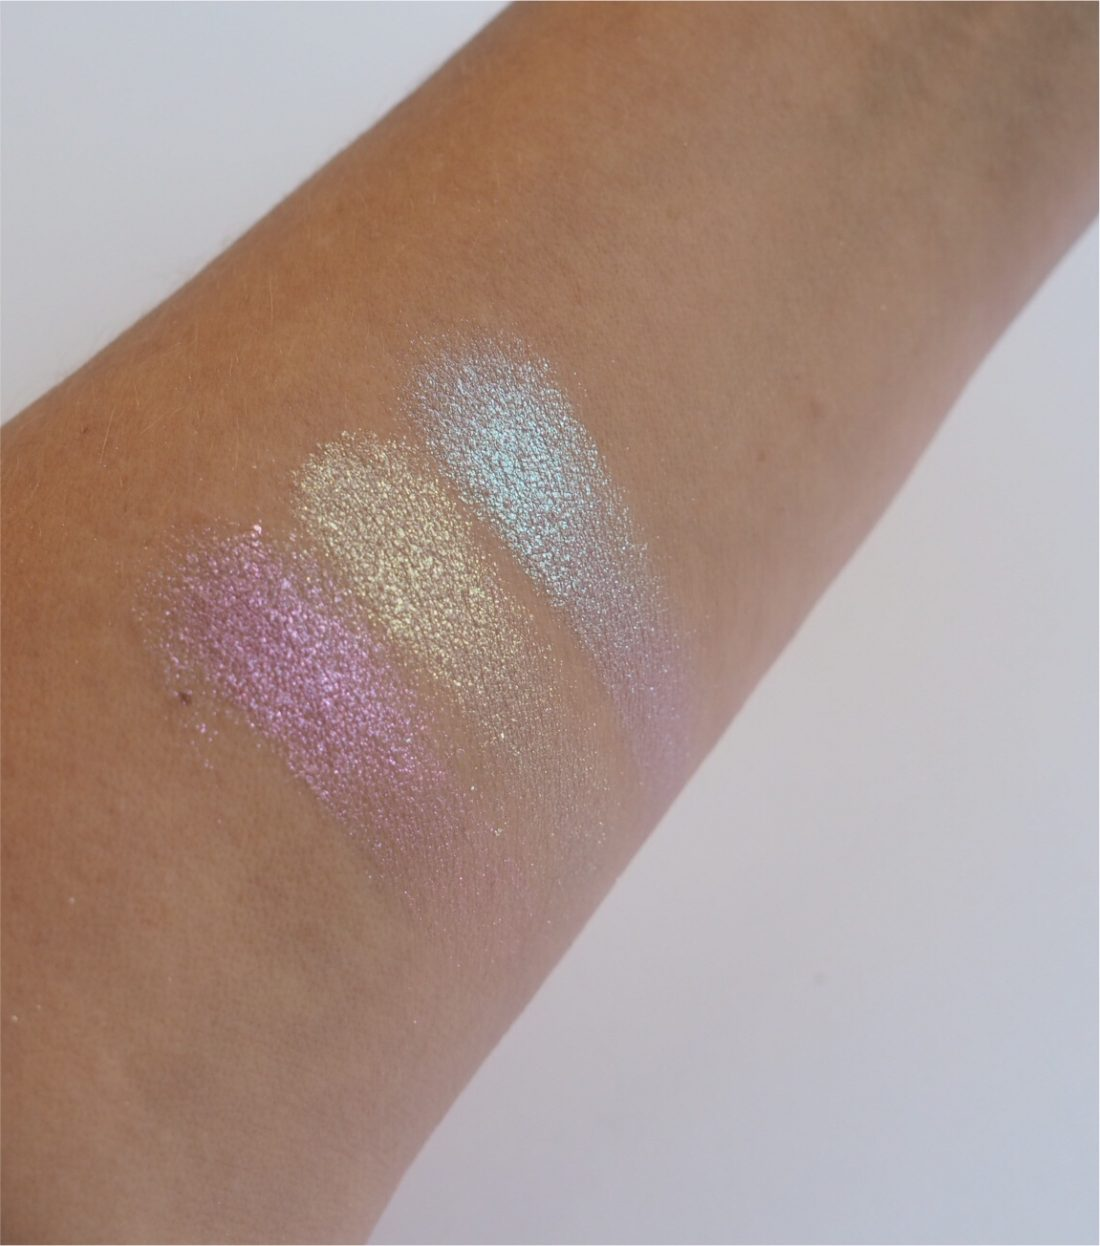 Phee's Makeup Highlighting Powders